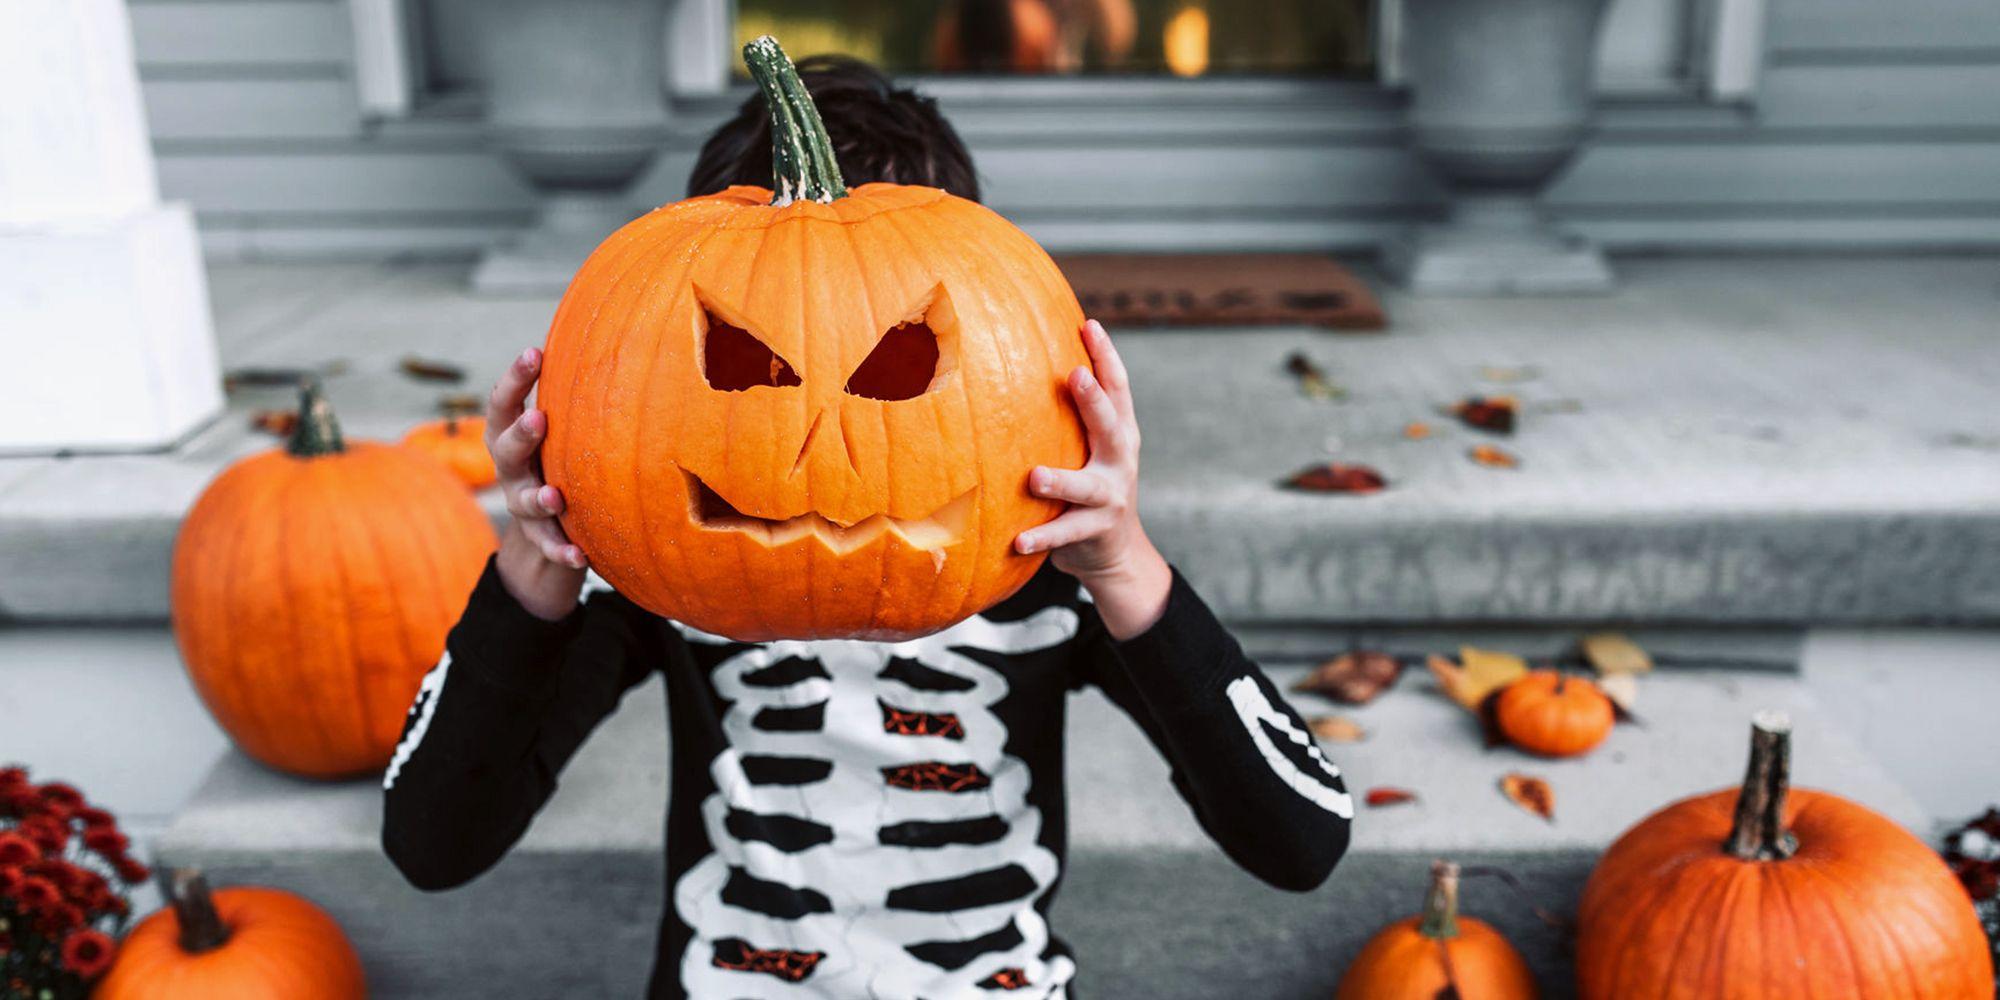 Pumpkin-Carving Kits to Take Your Jack-O'-Lantern to the Next Level